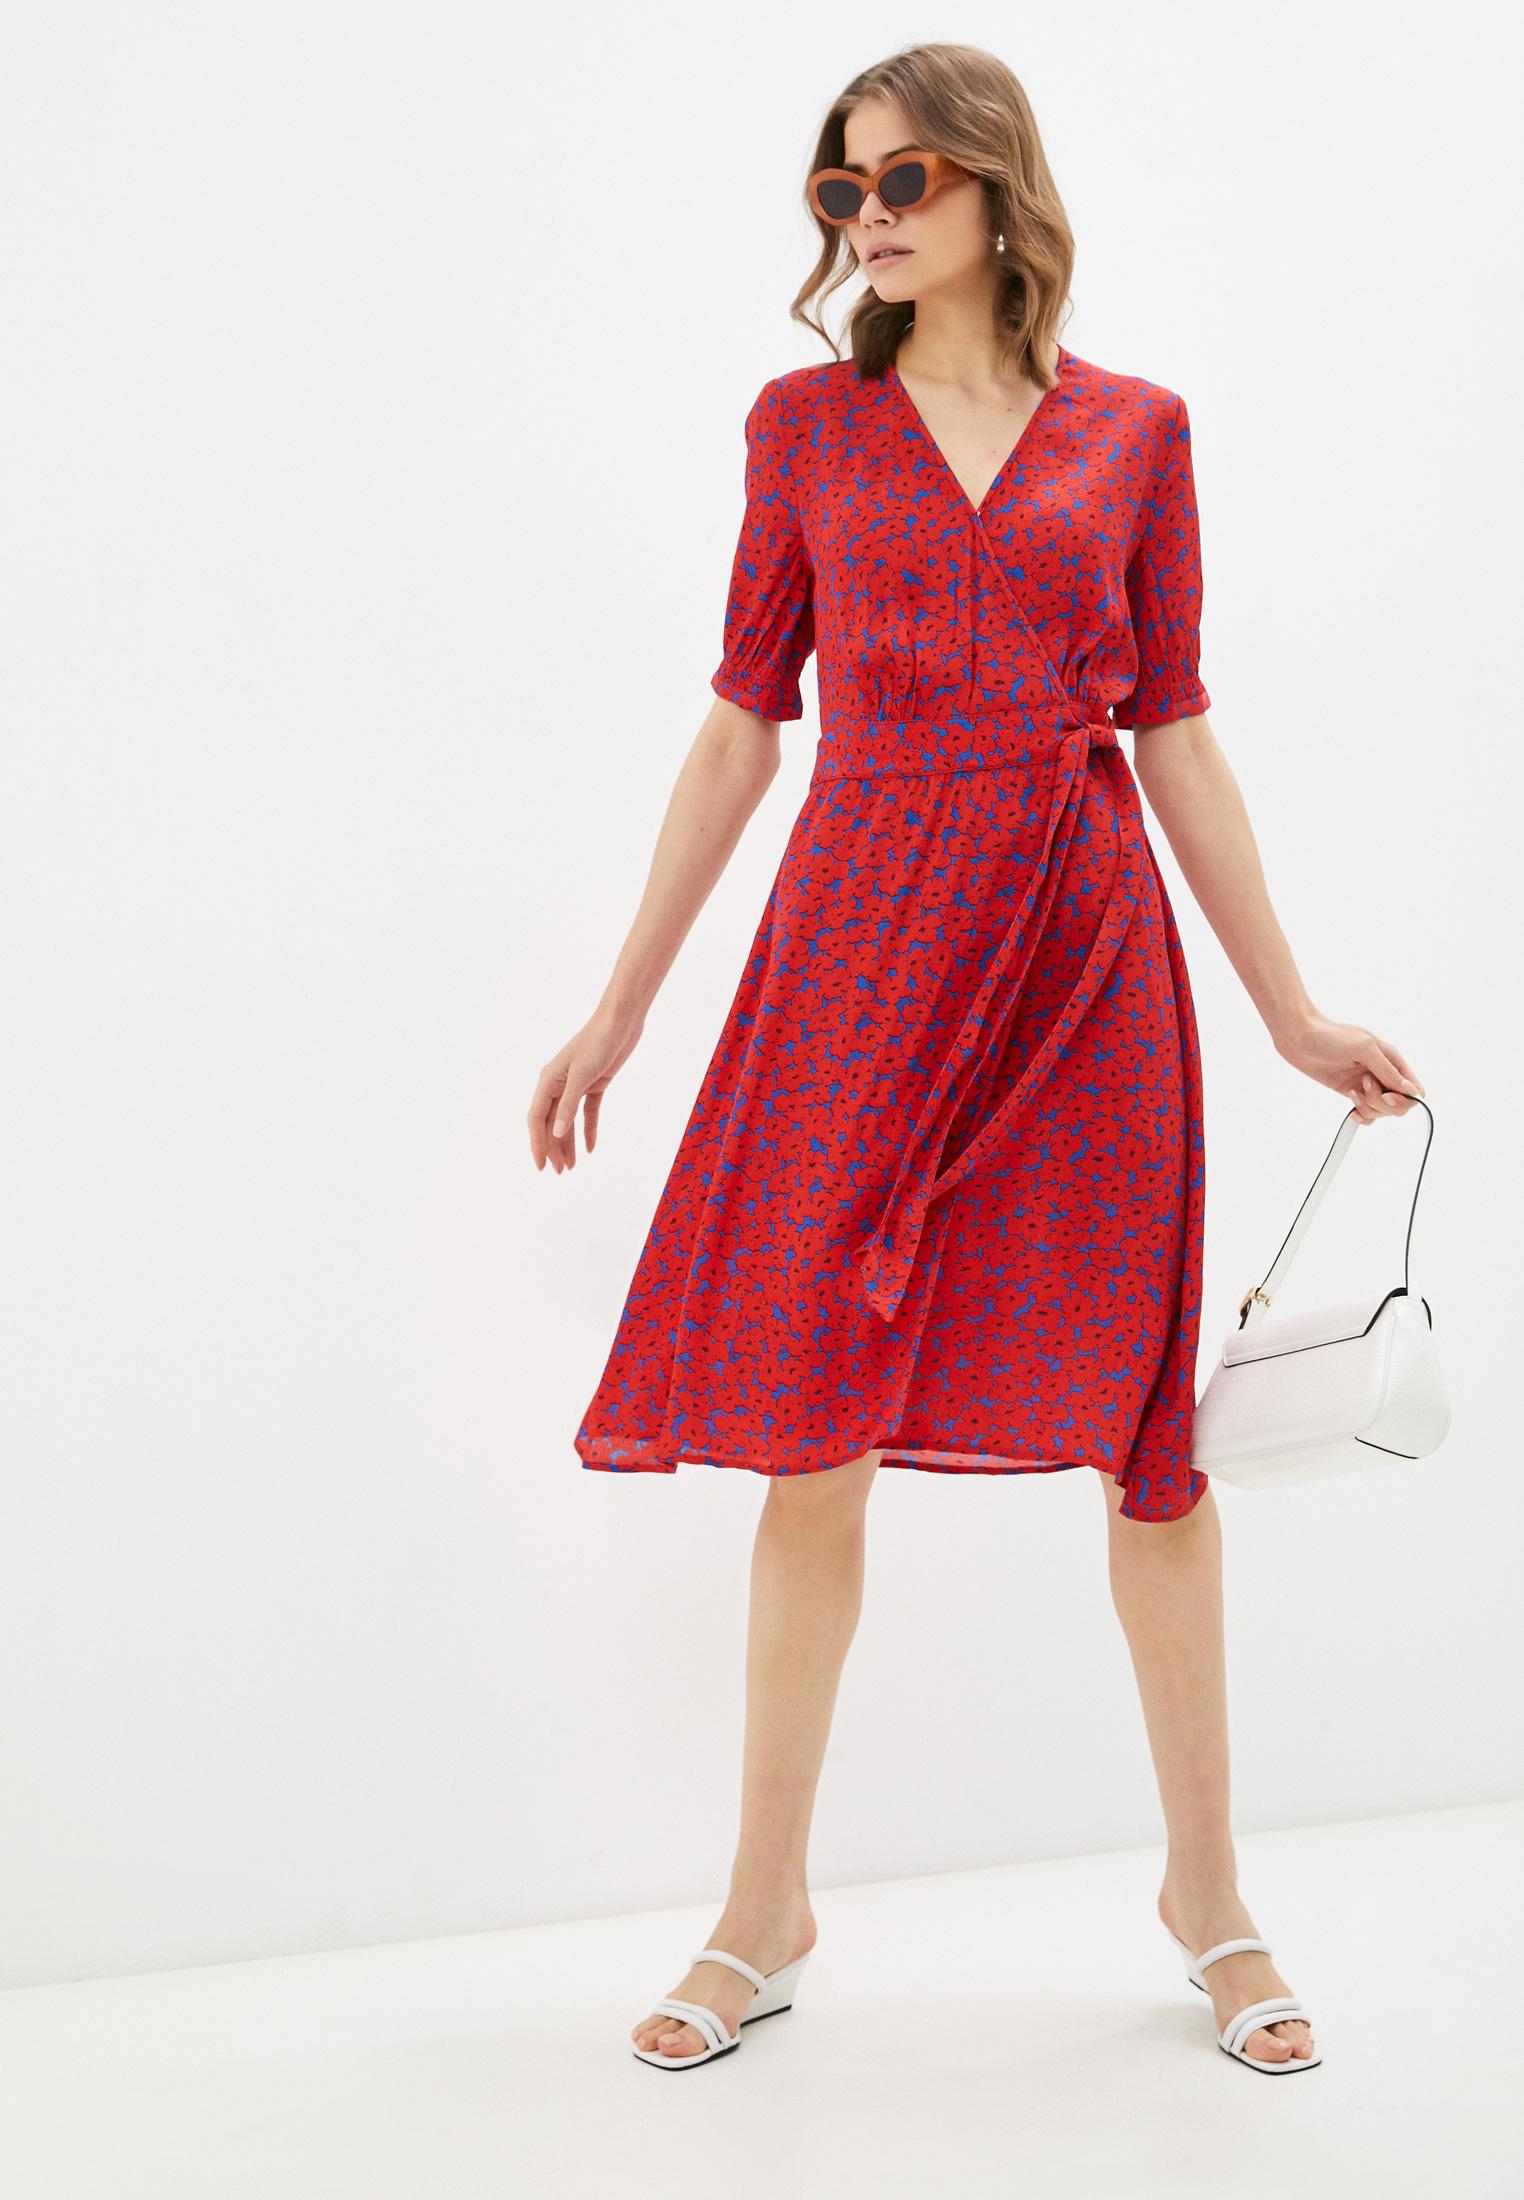 Платье Tommy Hilfiger (Томми Хилфигер) WW0WW30351: изображение 2